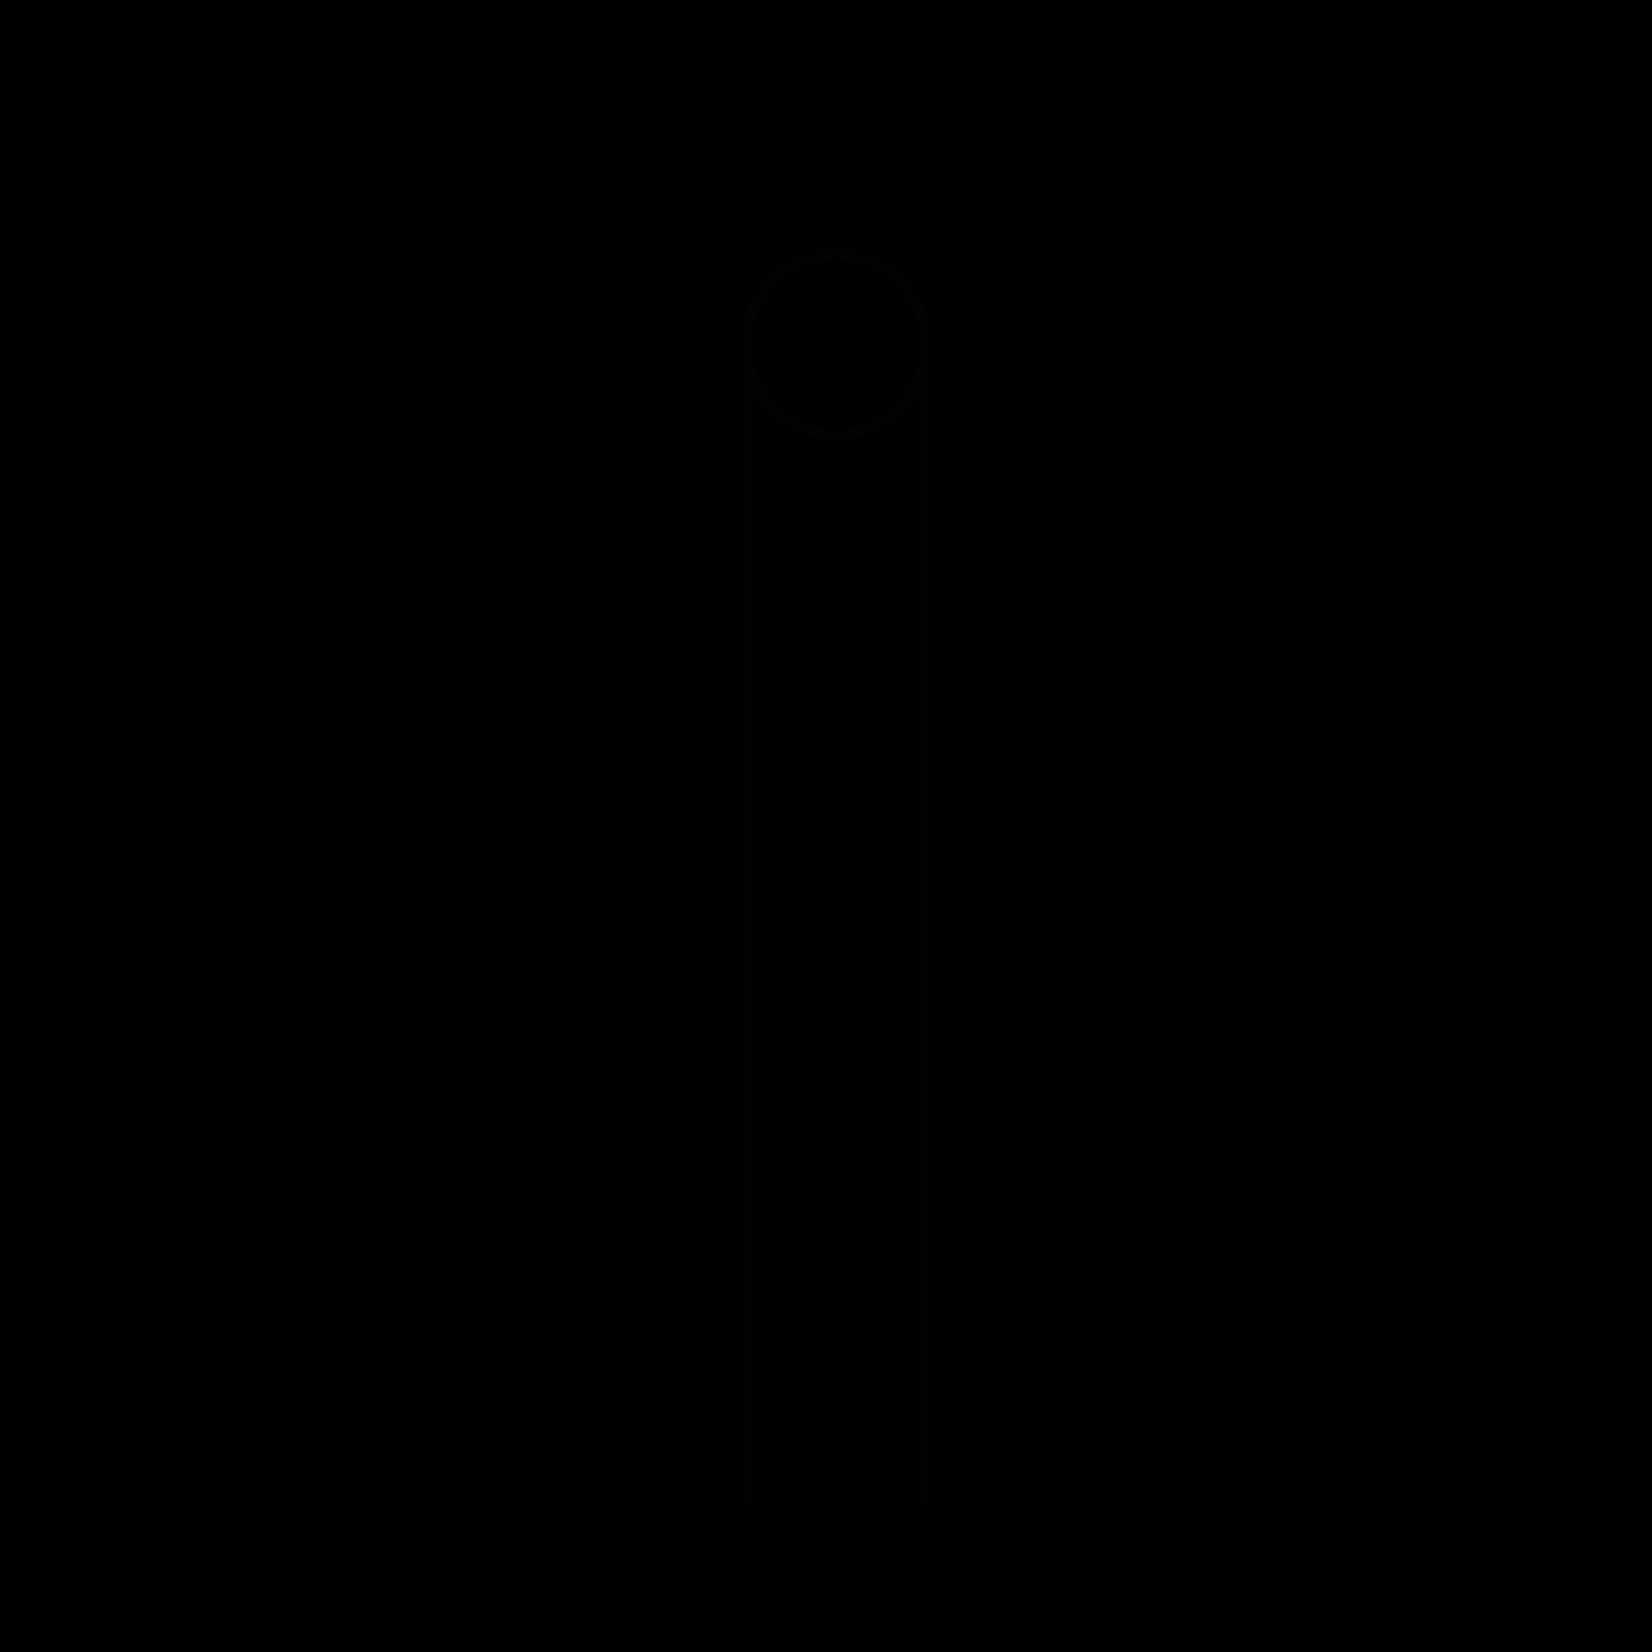 Botanopia Plant stake - Pin